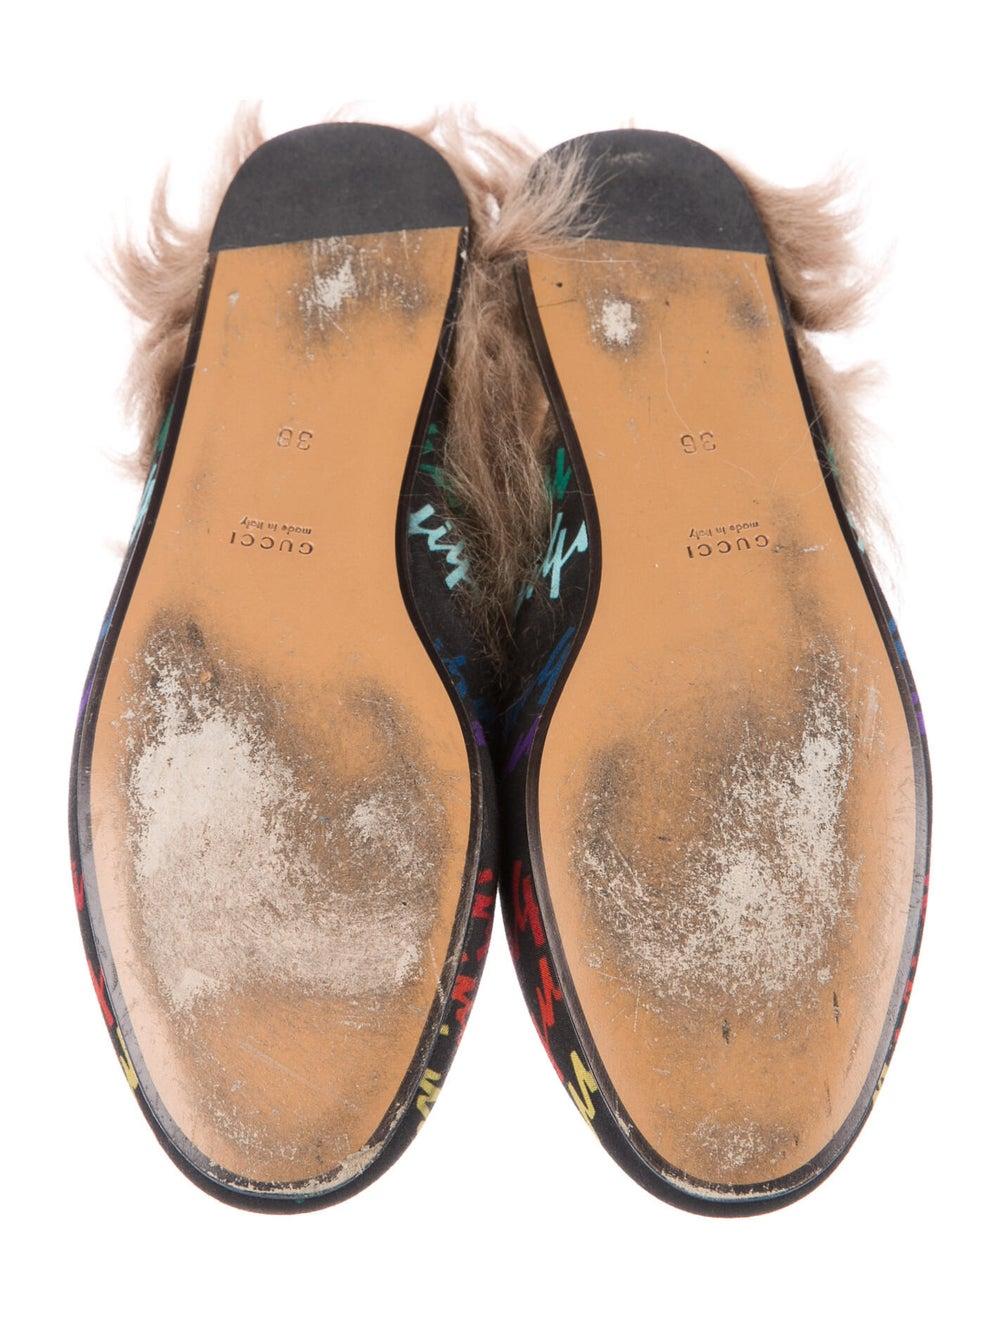 Gucci Princetown Horsebit Accent Mules Black - image 5